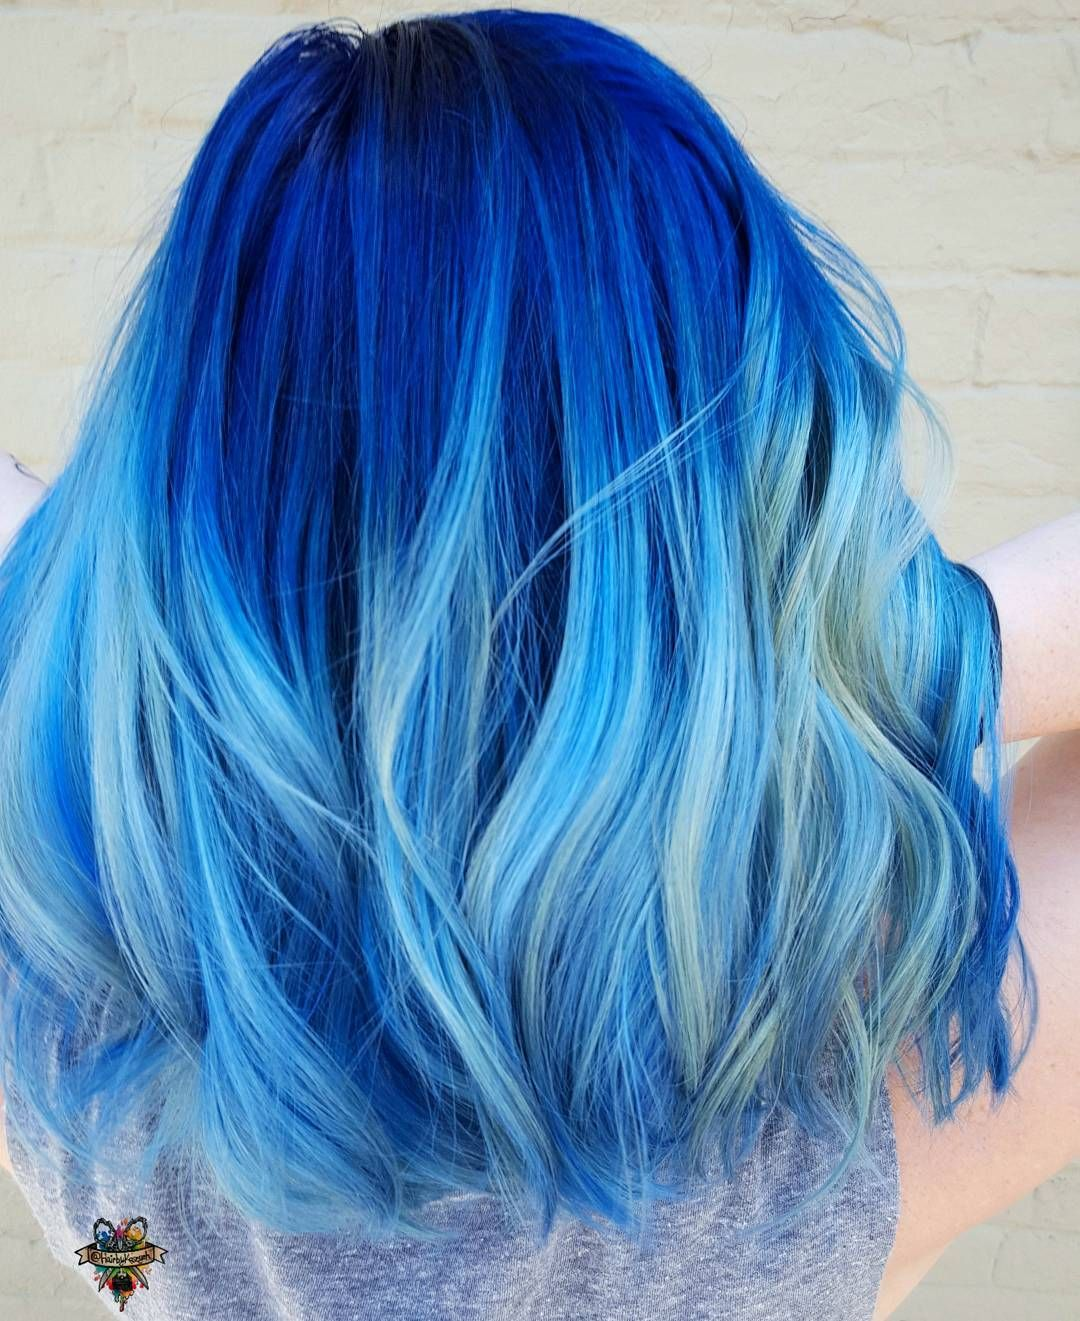 Kasey Ohara Skrobe Married Vivid Hair Color Specialist Md Book